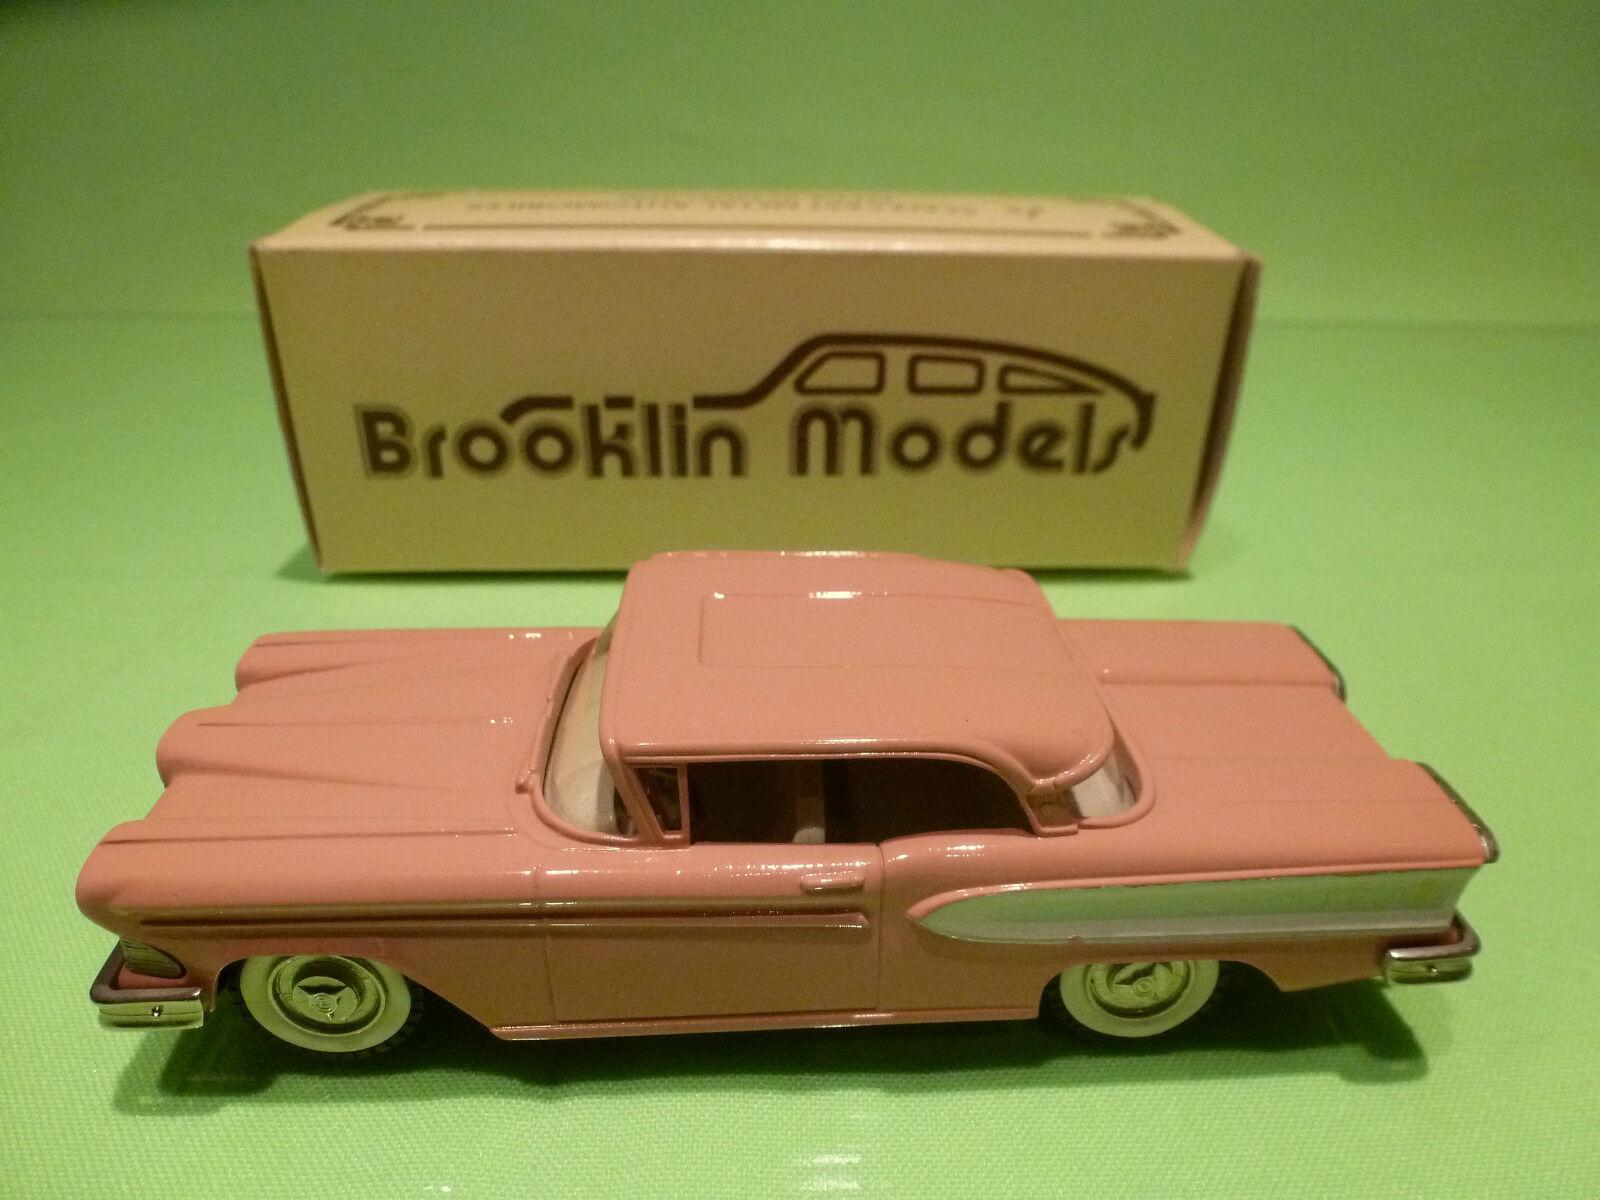 BROOKLIN MODELS BRK 22 22 22 EDSEL CITATION TWO-DOOR HARDTOP 1958 - 1 43 - NMIB 51b917